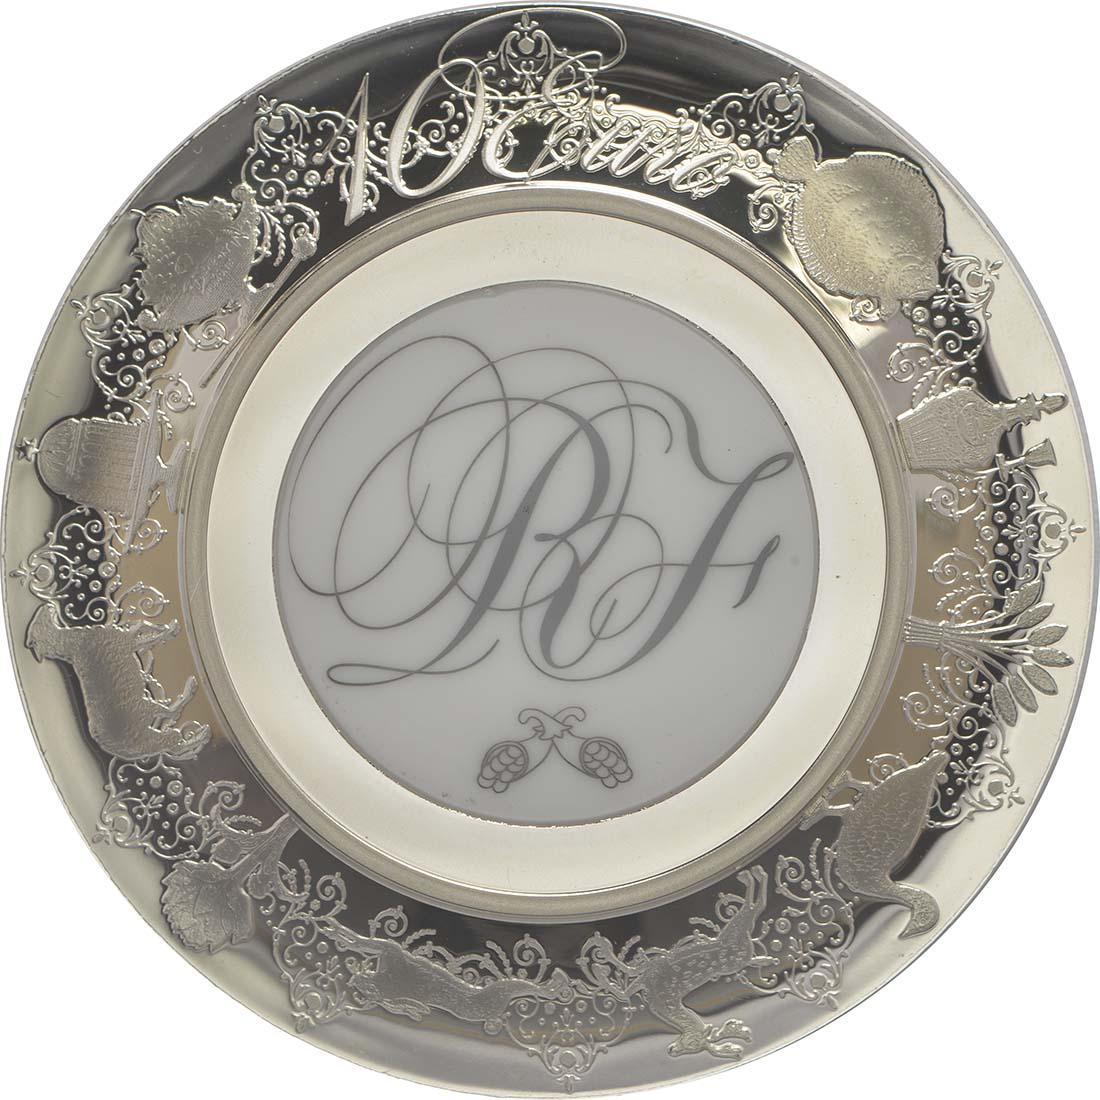 Rückseite:Frankreich : 10 Euro De la Cuisine à l'Assiette - mit Keramikeinlage - Münze gebogen  2015 PP